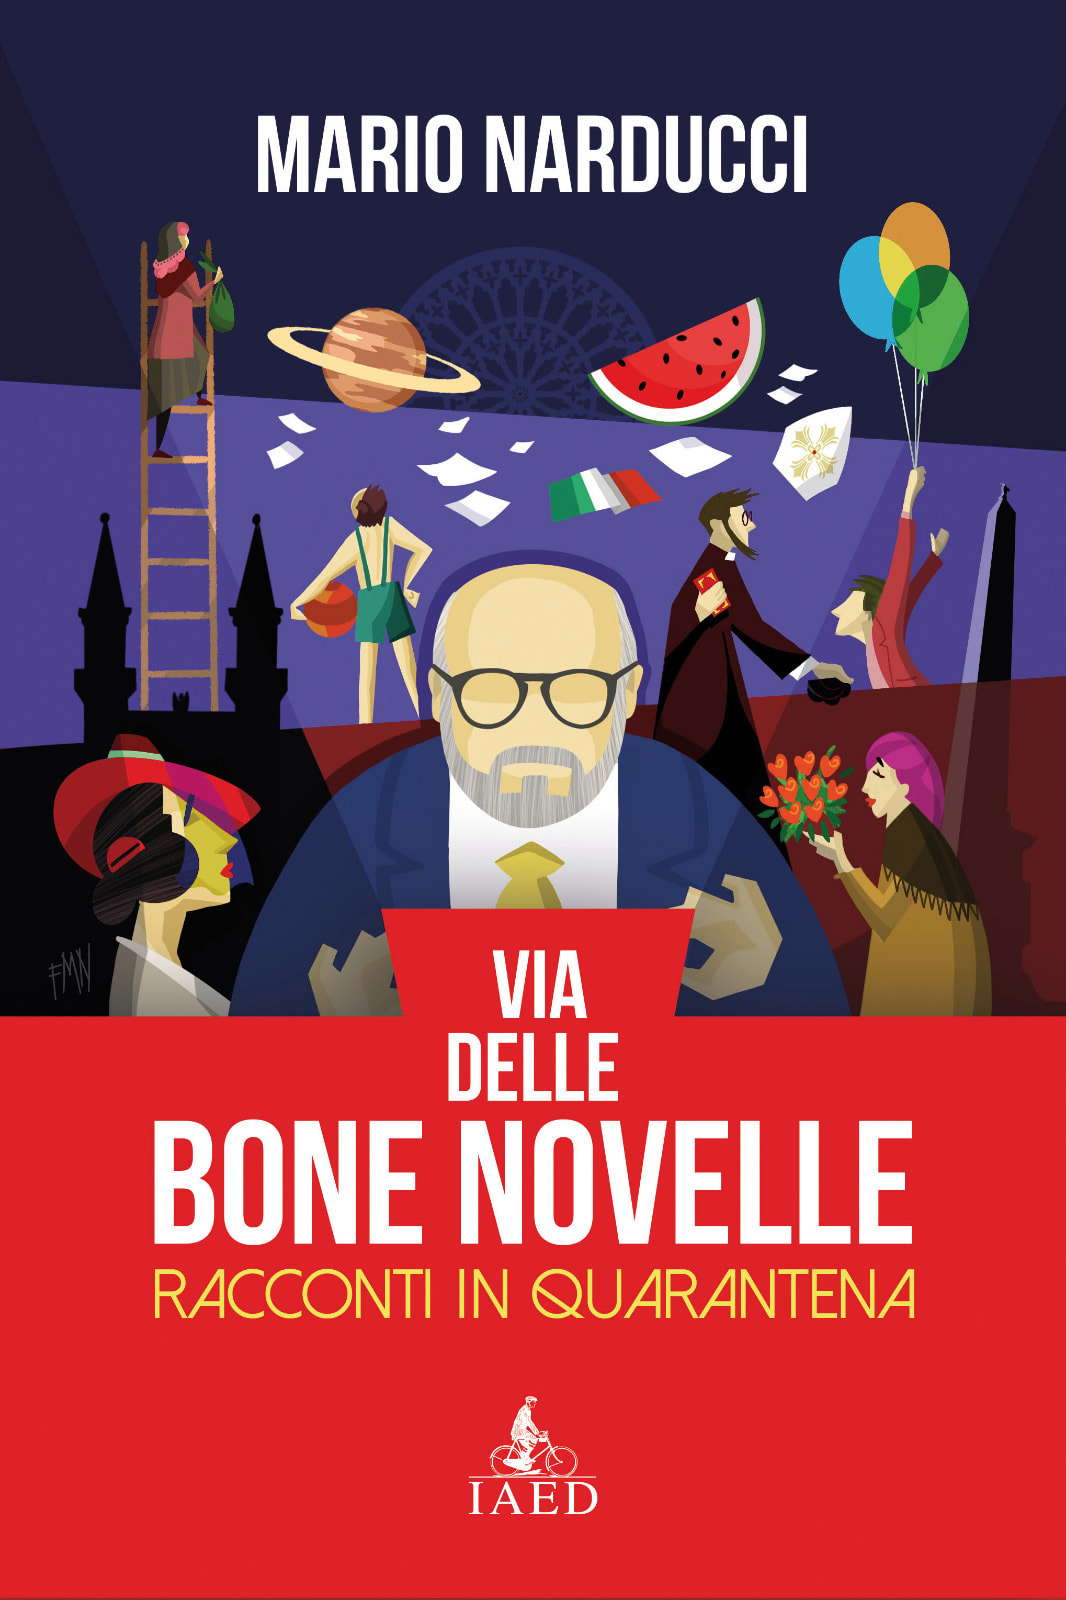 Narducci-Bone-Novelle.jpg